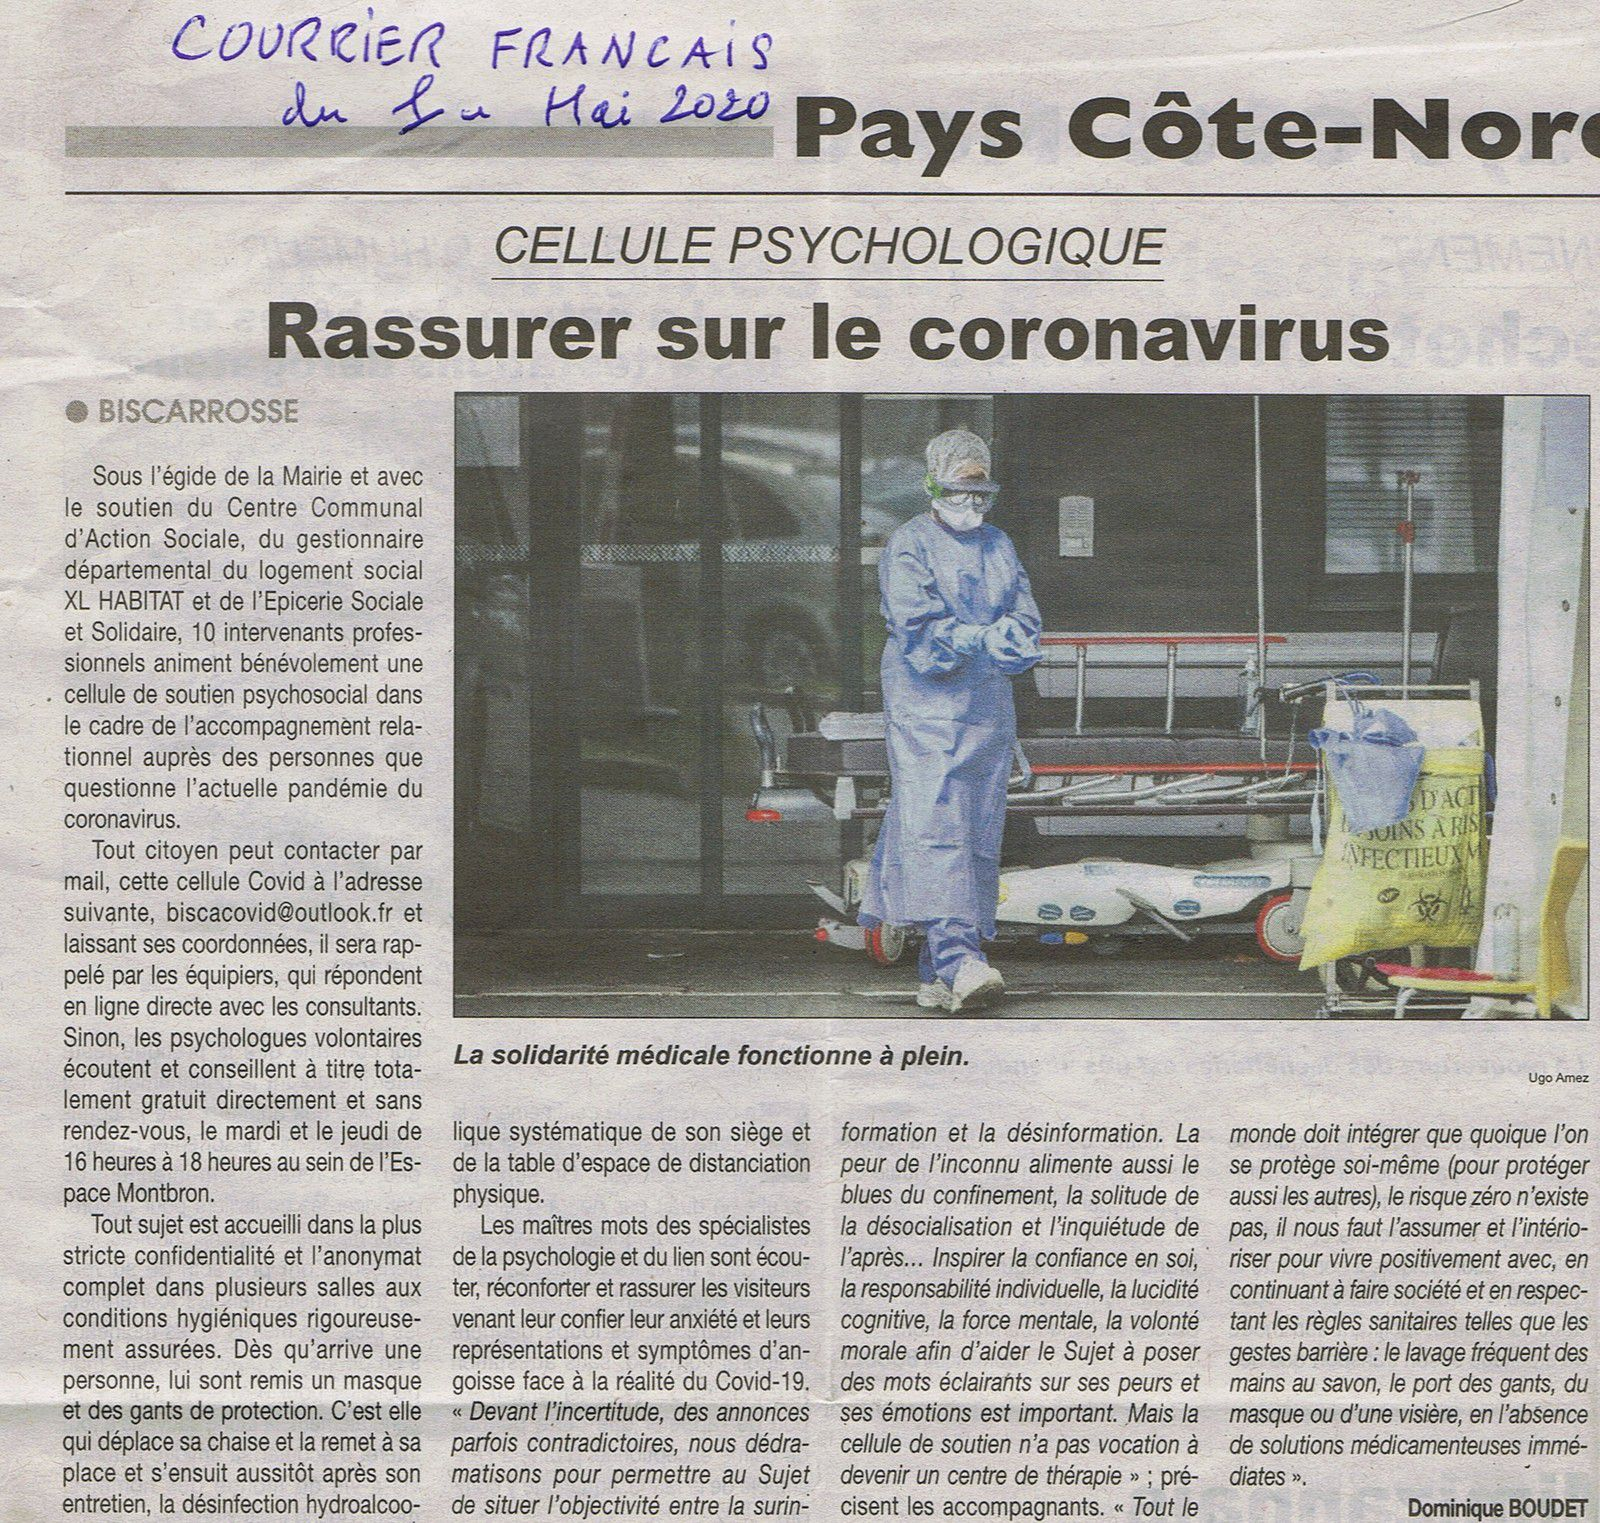 Rassurer sur le coronavirus.